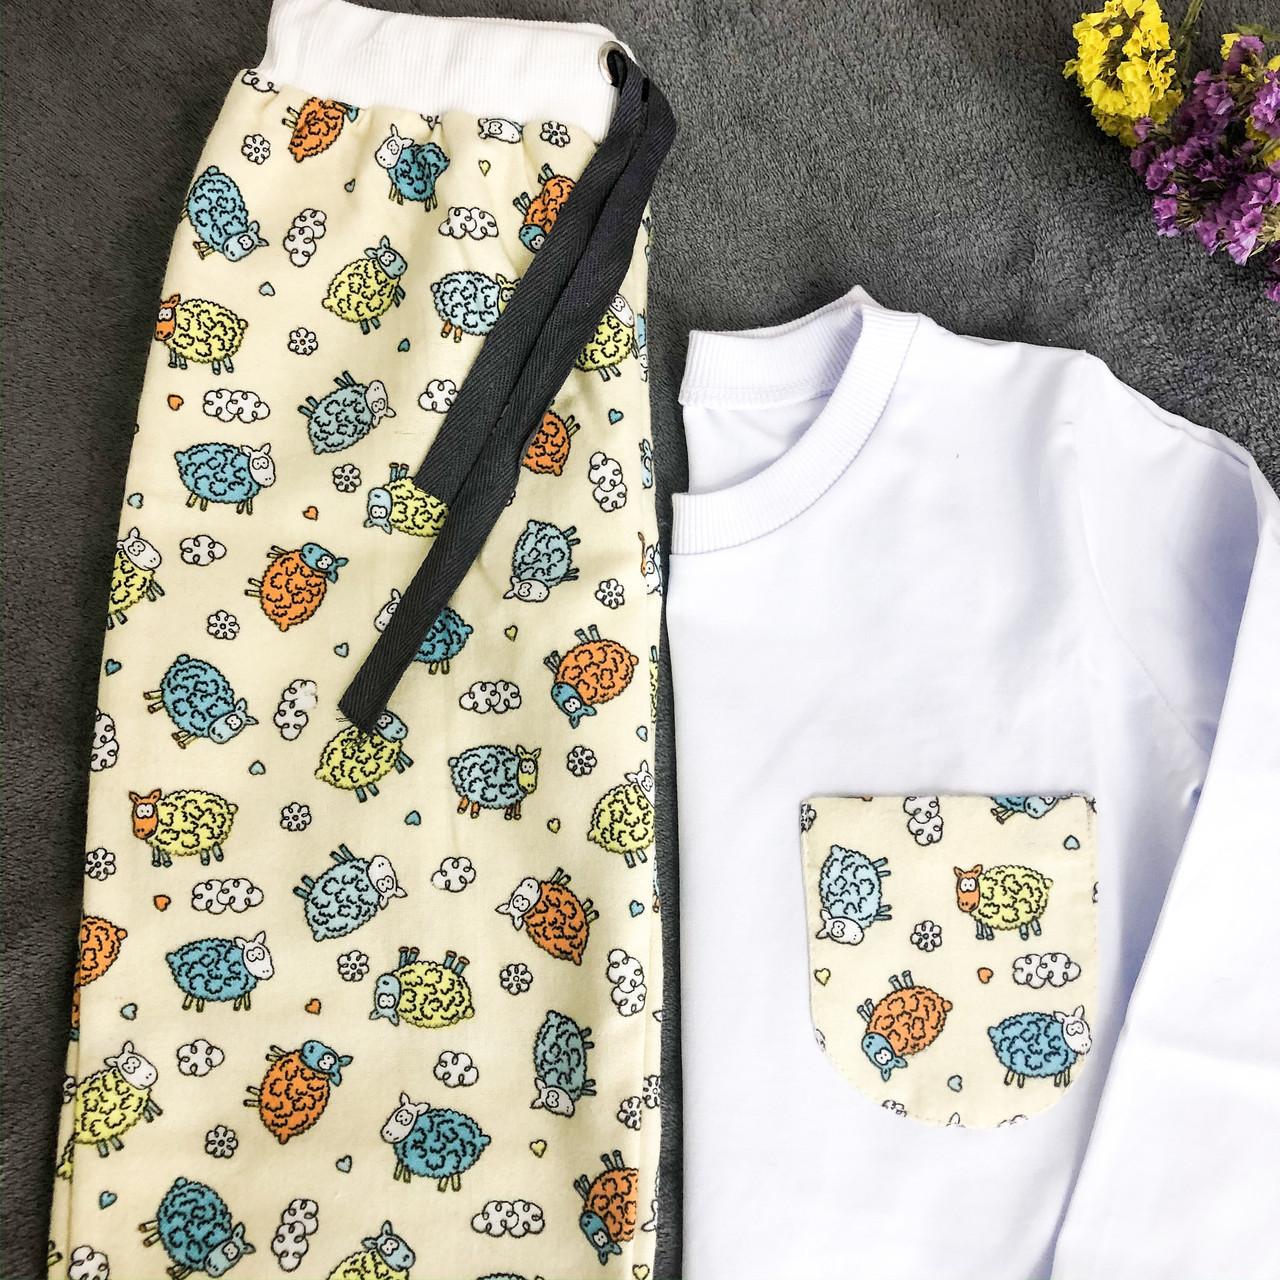 Фланелевая пижама с кофтой Овечки XXXL